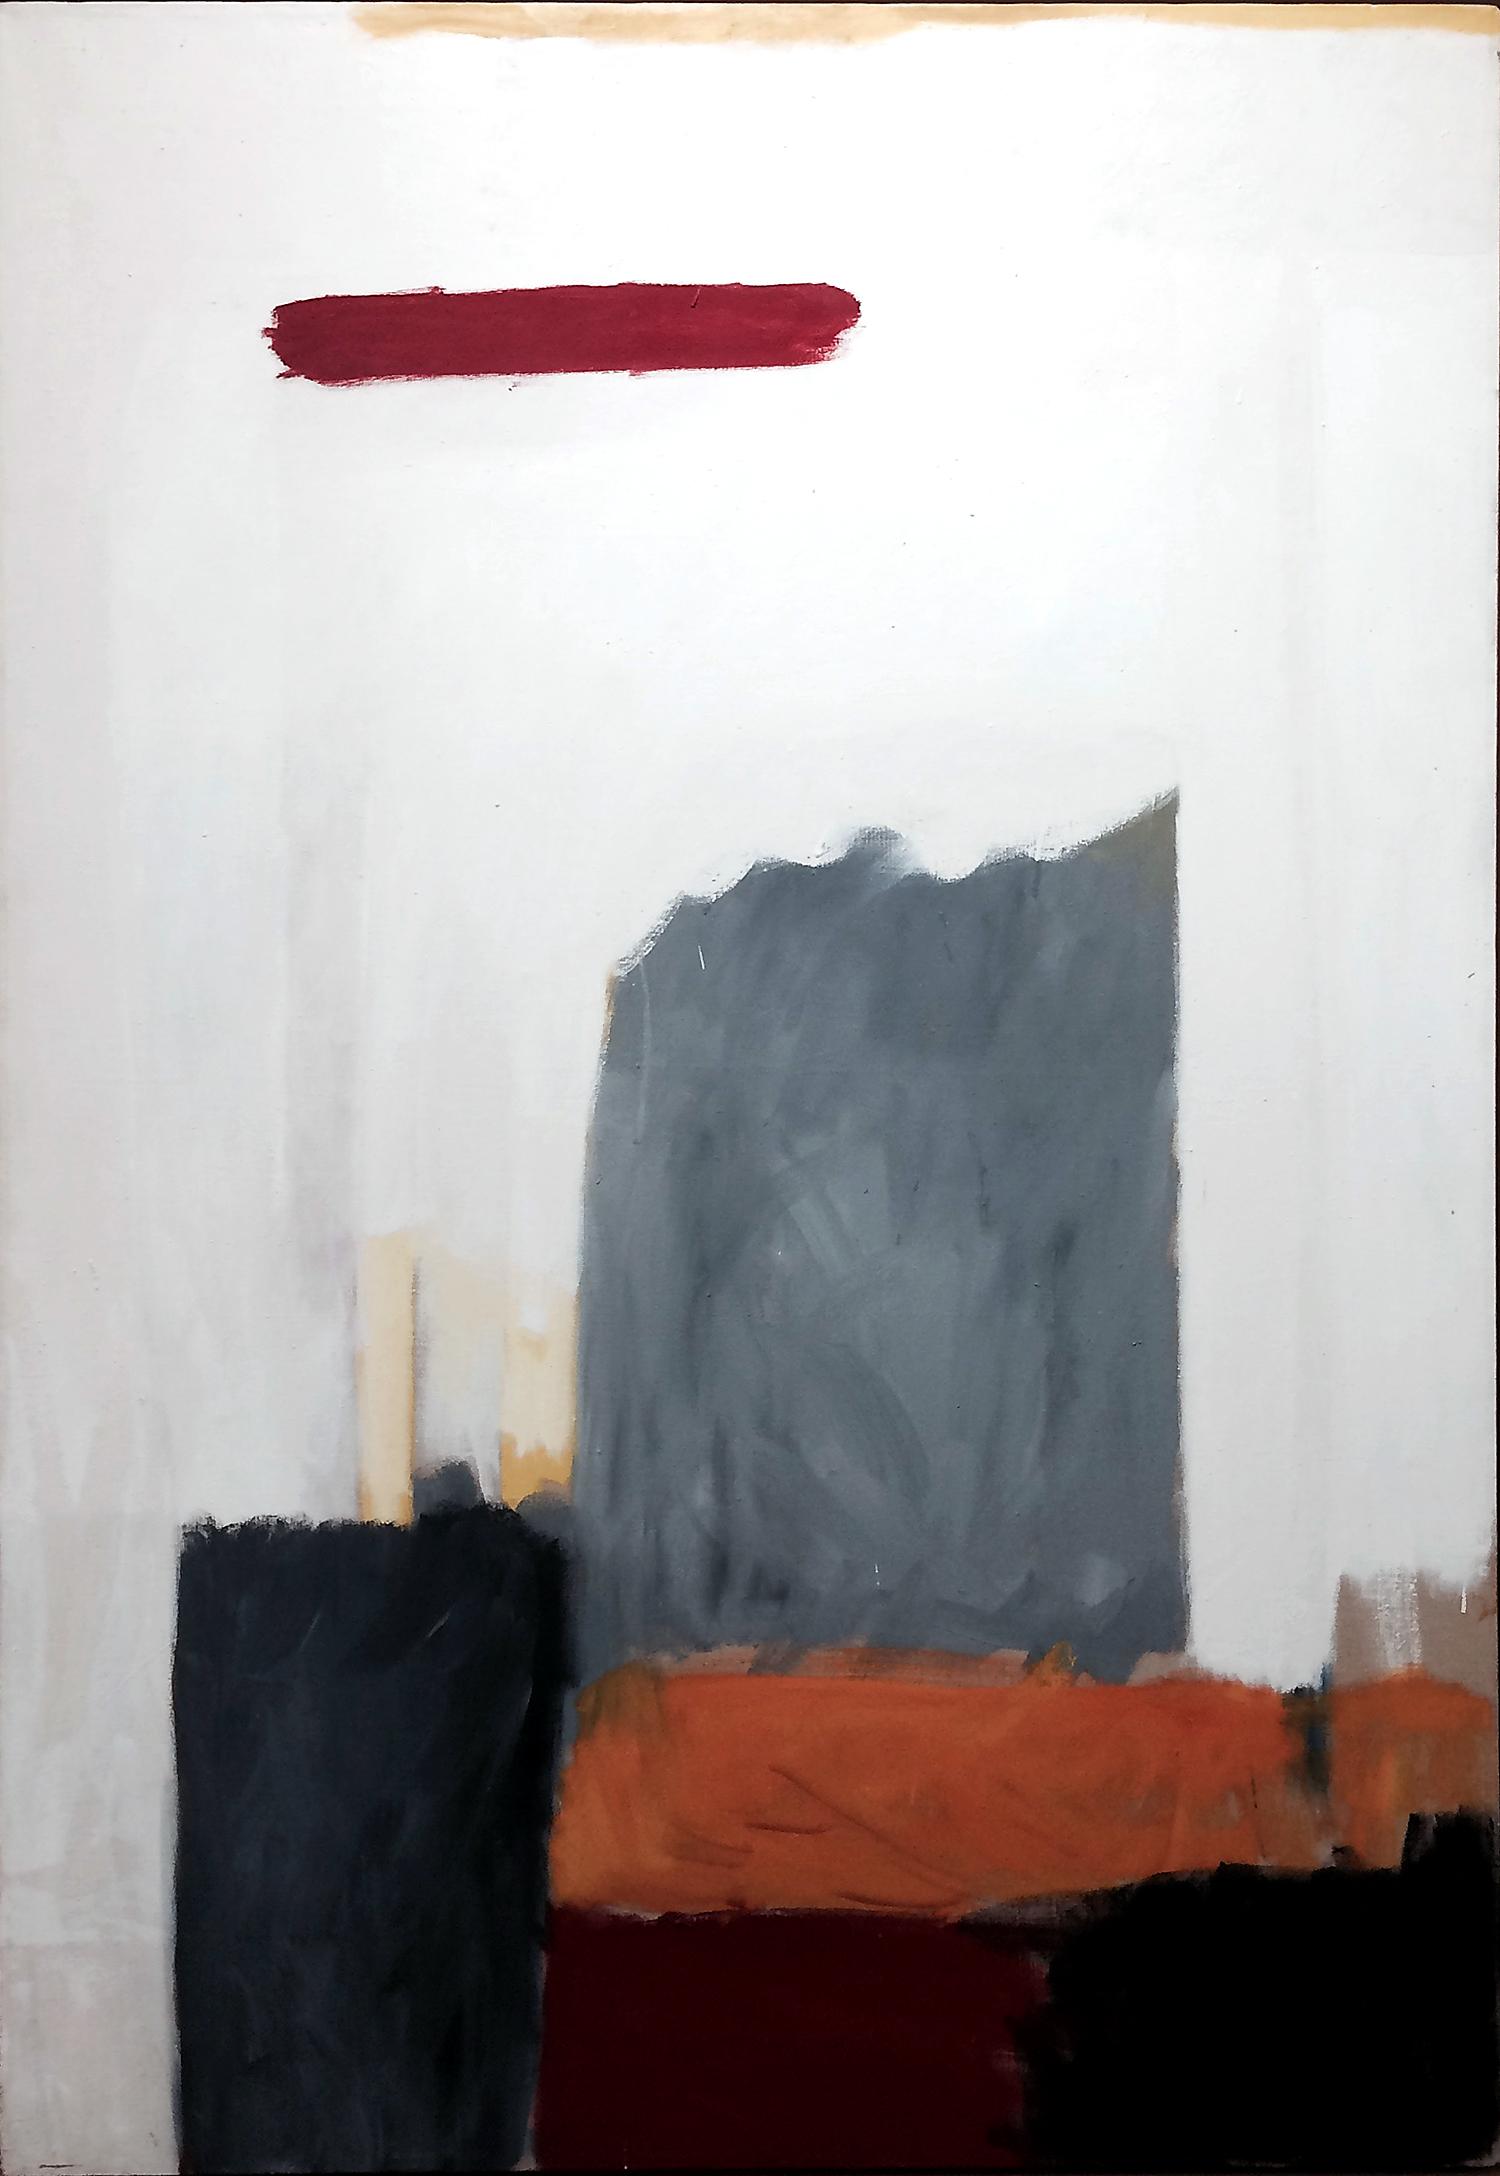 Giorgio Cavallon, Manny Silverman Gallery